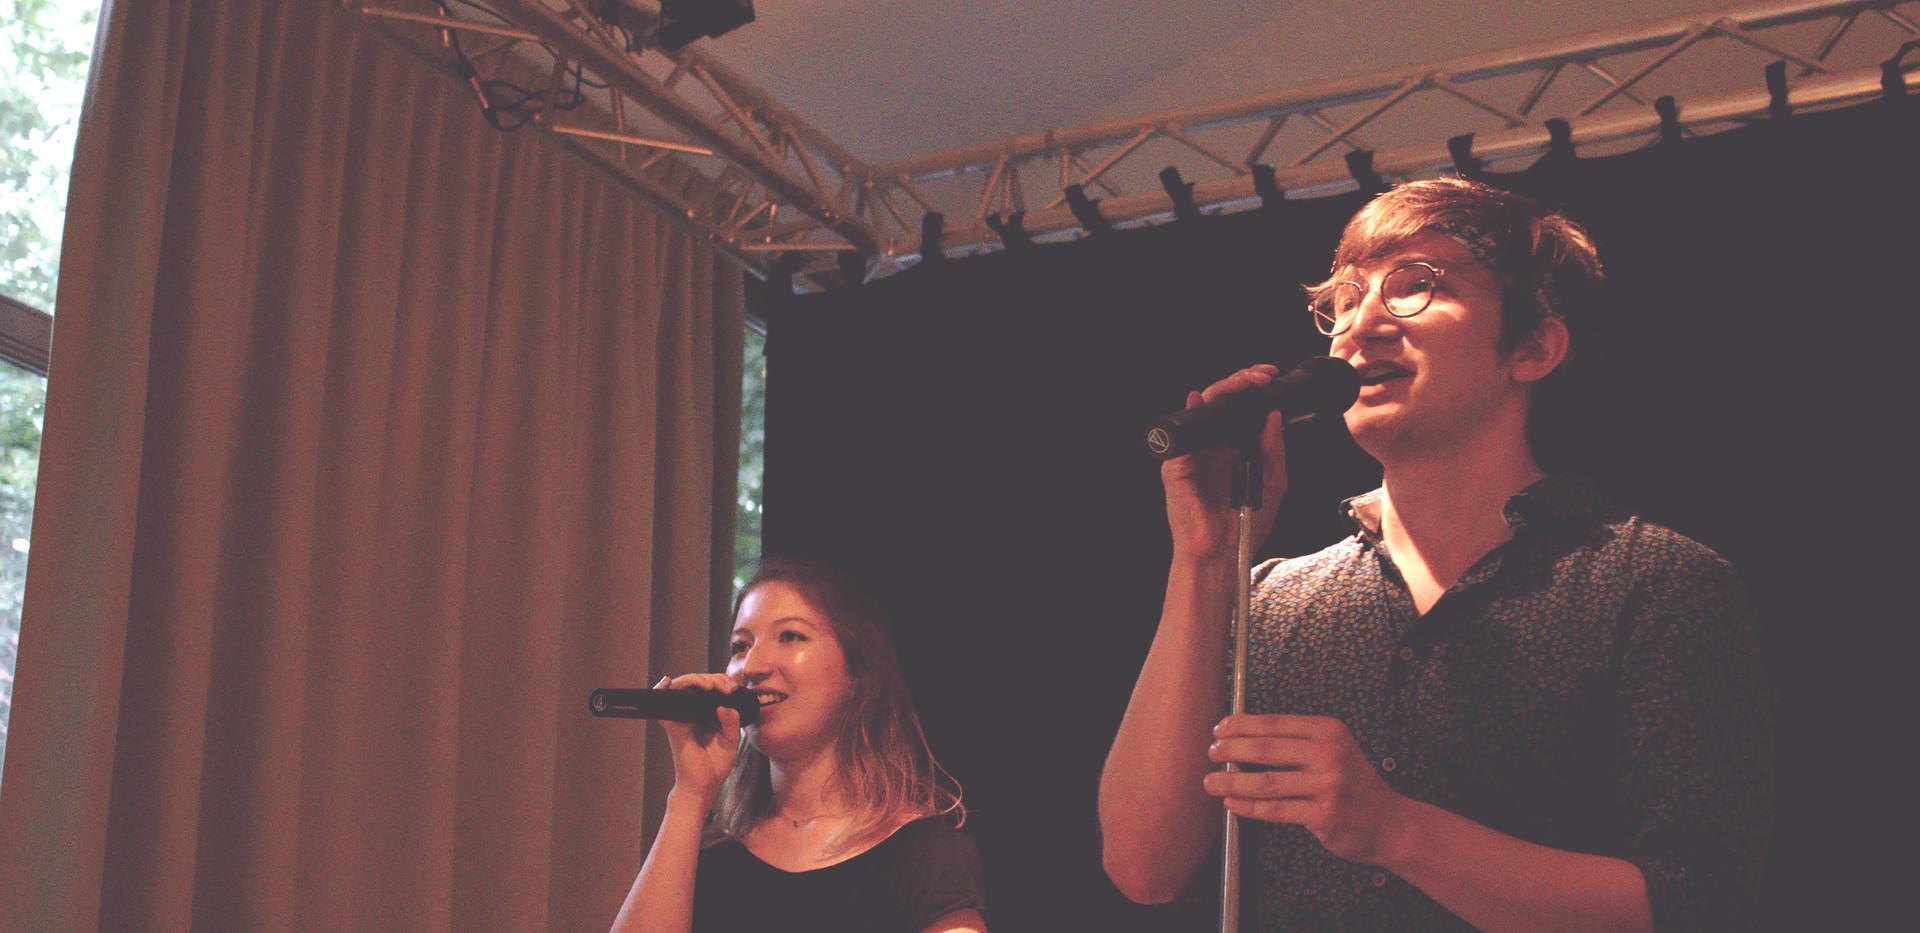 Istvan+Kathi @ Enjoy your Voice Sommerkonzert